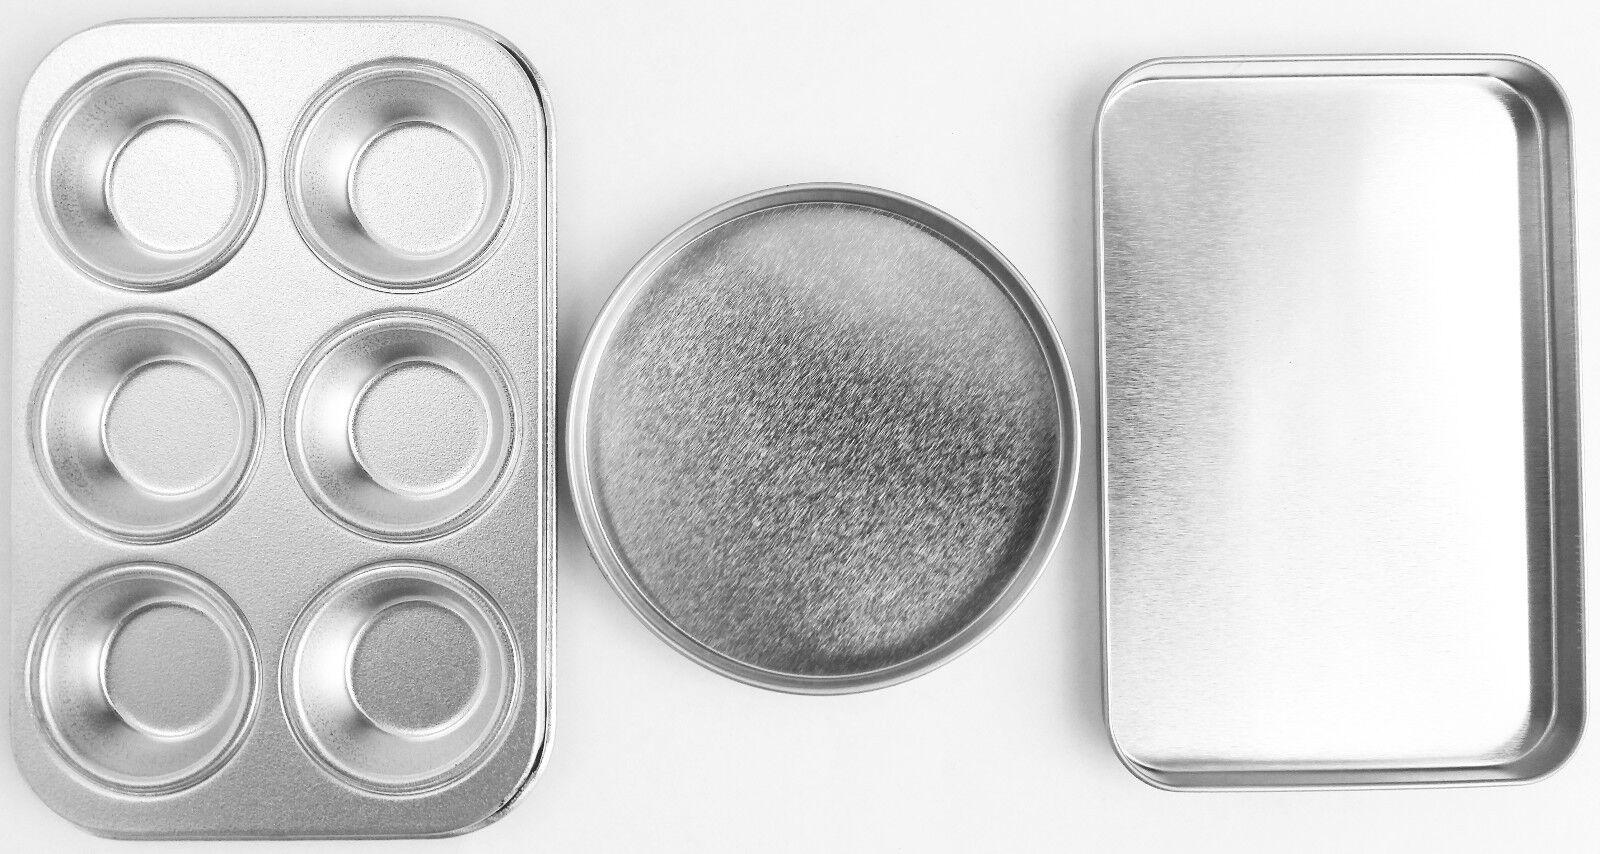 Baking Pan Set for EASY BAKE Ultimate Oven - Brand New Repla